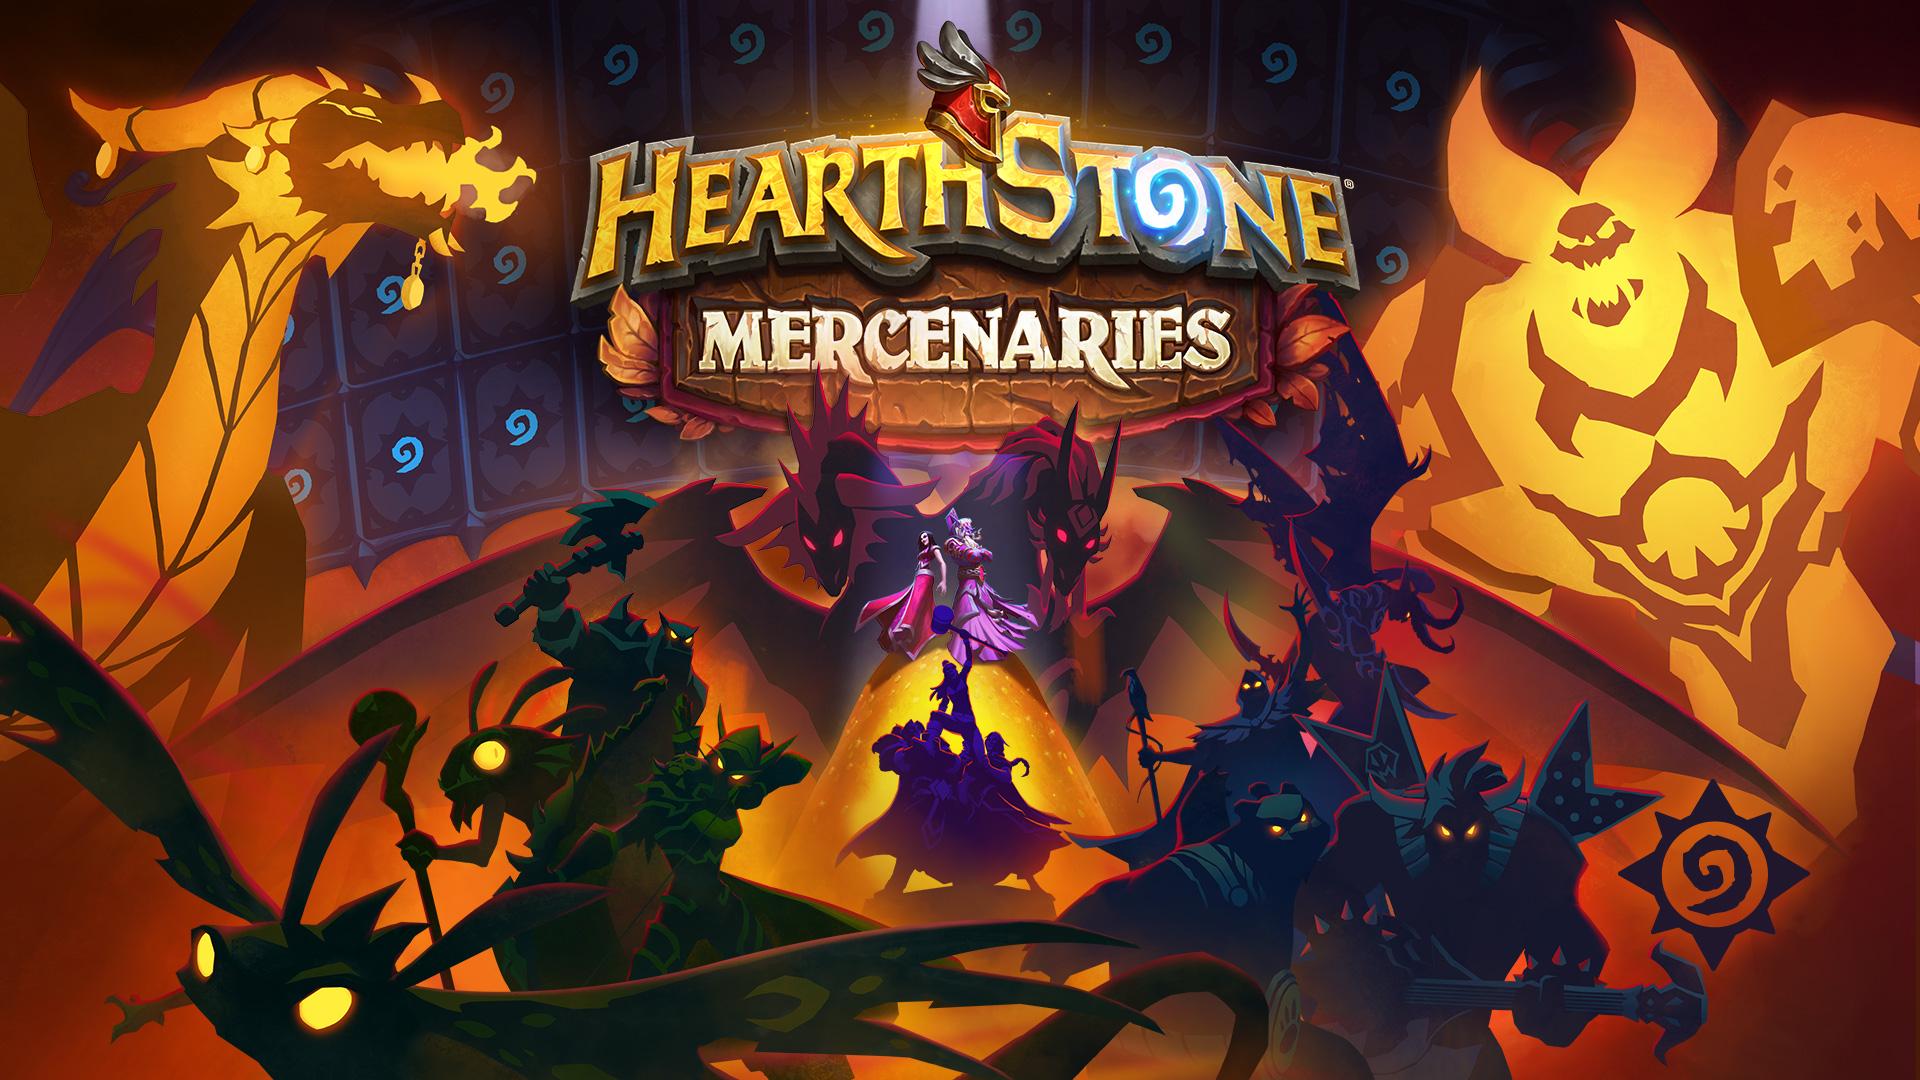 Hearthstone Mercenaries tips & tricks